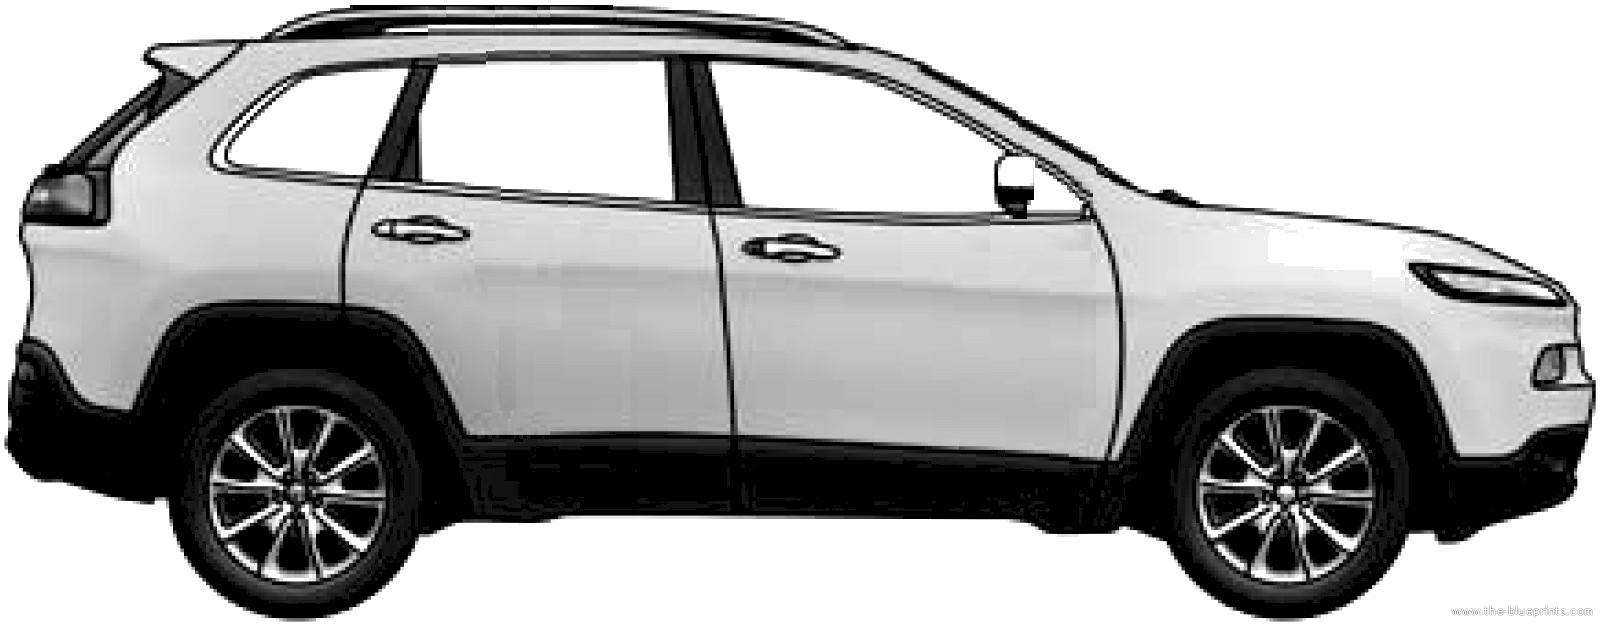 the-blueprints - blueprints > cars > jeep > jeep cherokee (2013)